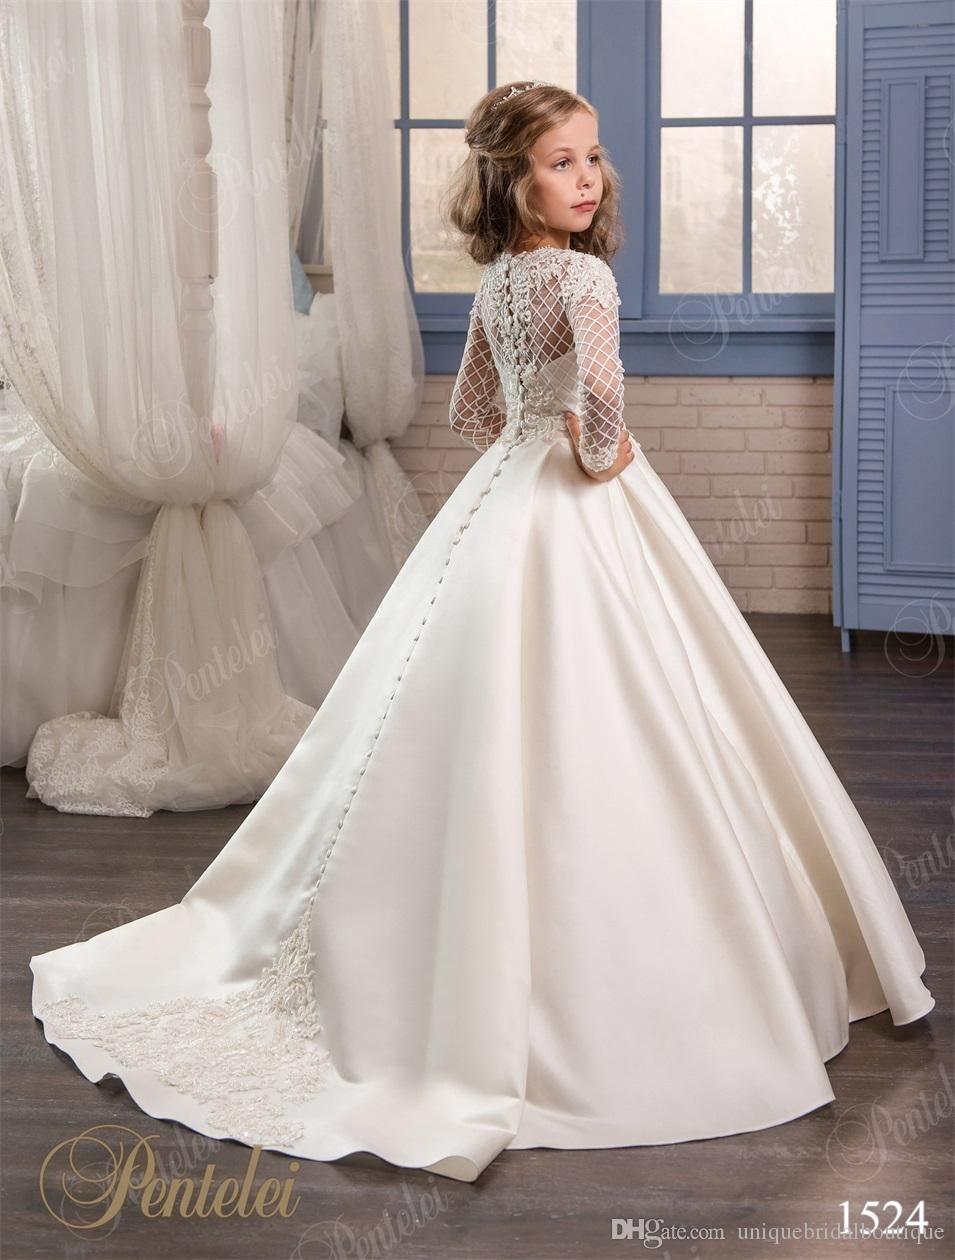 Wedding Dresses For Little Girls 2017 Pentelei Cheap With Long ...